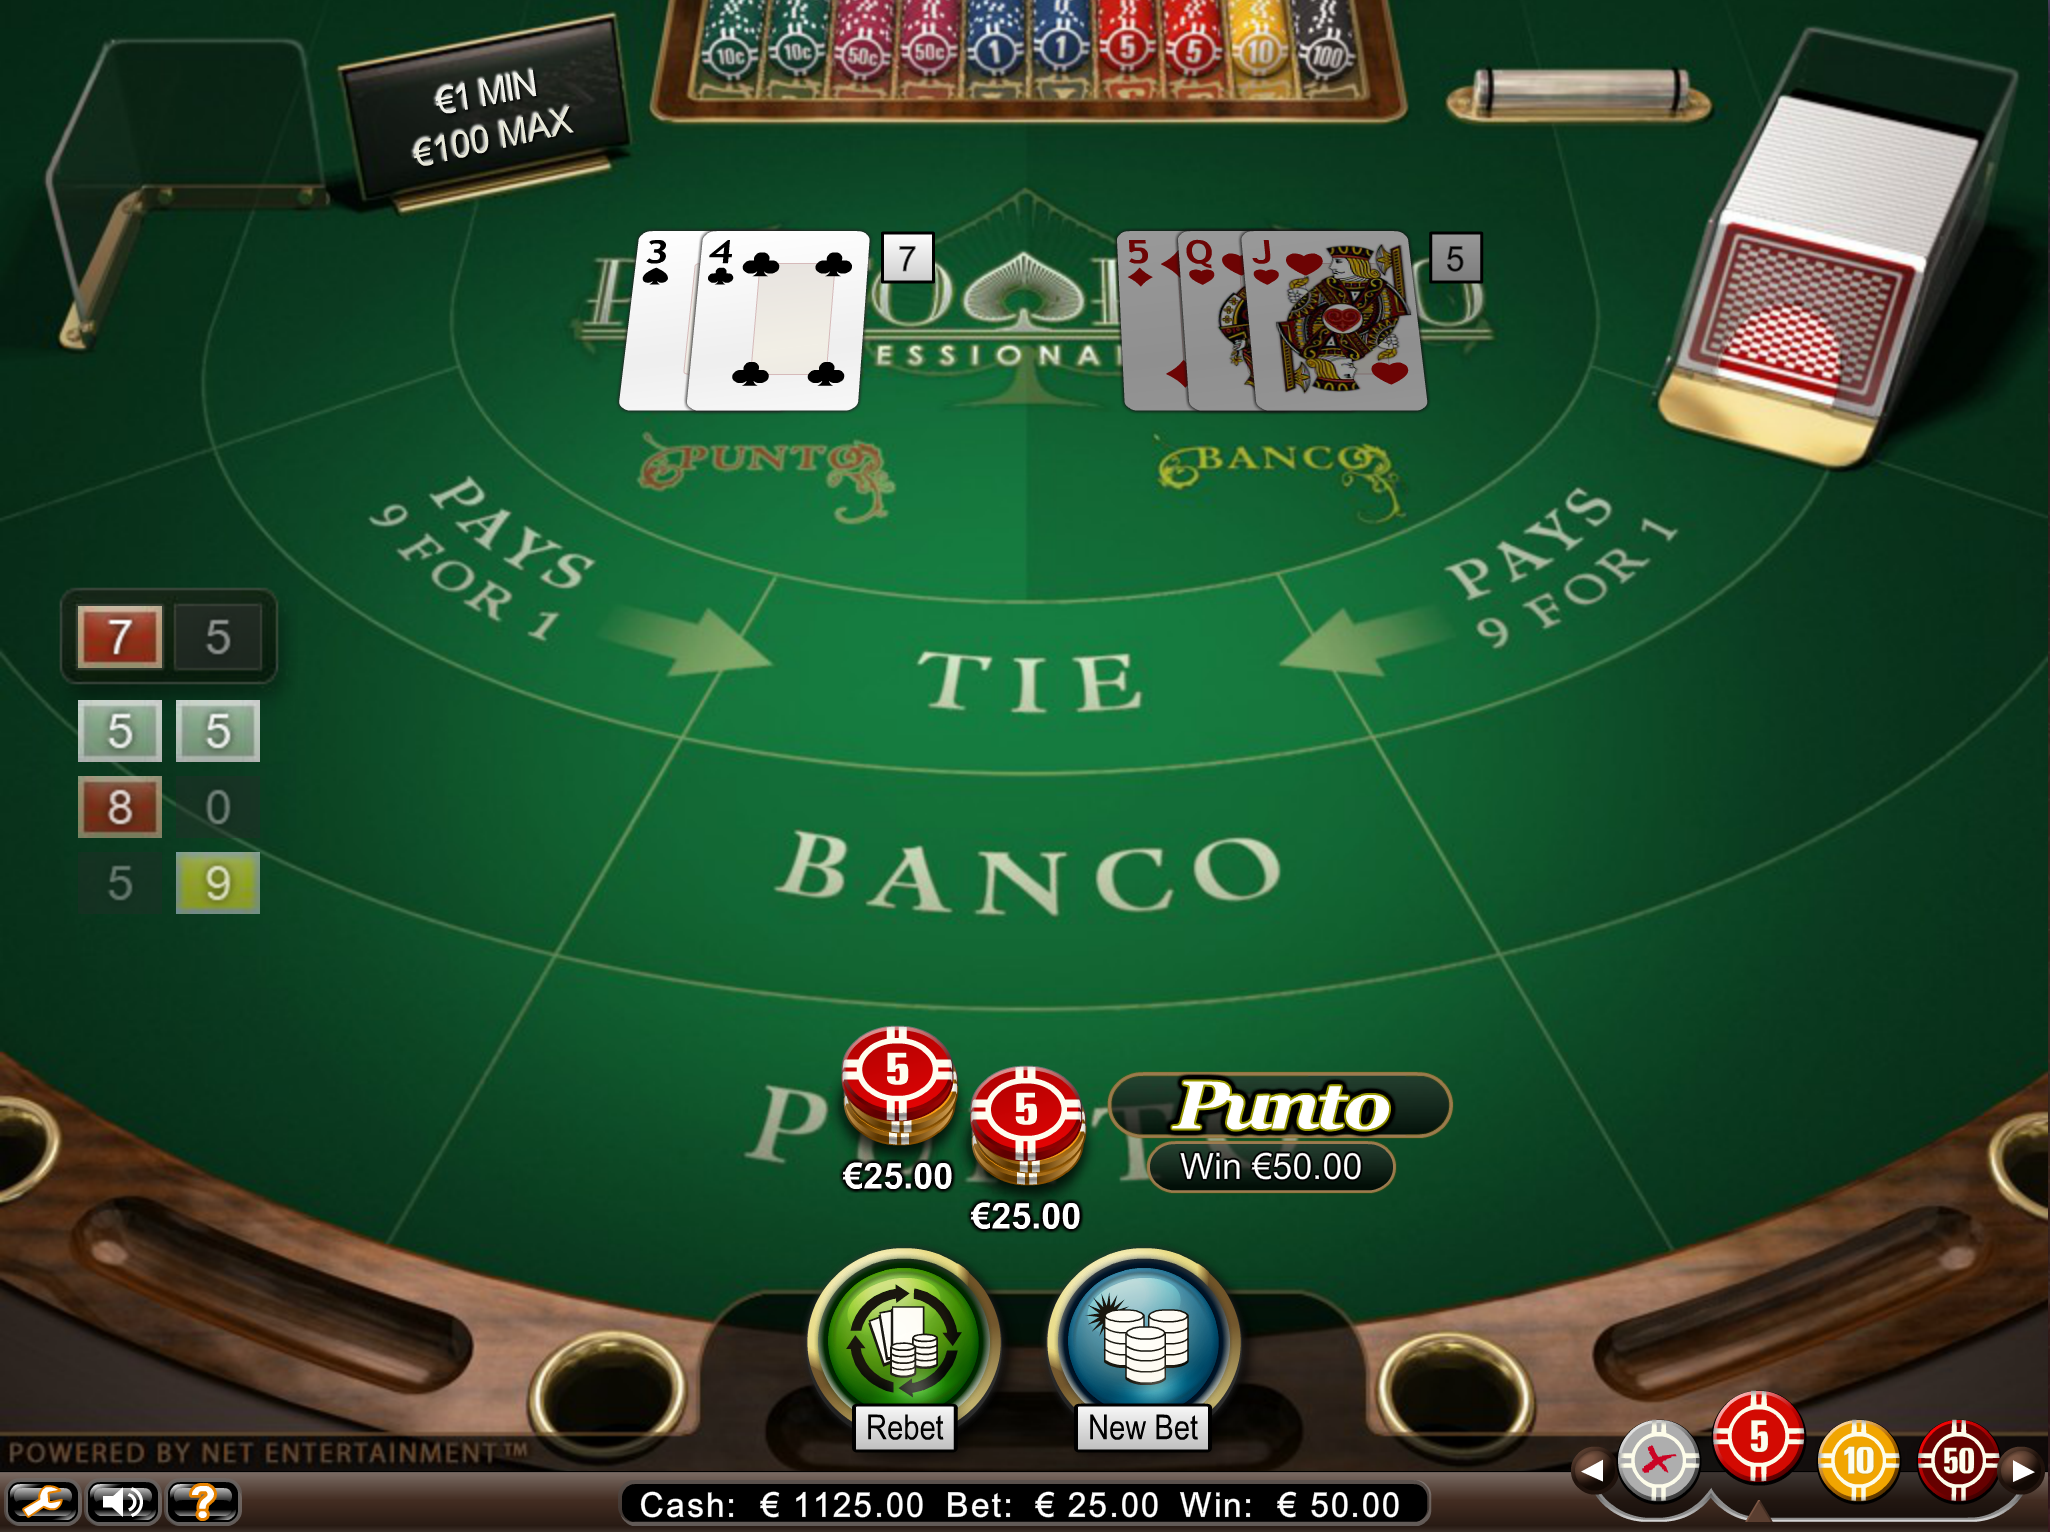 Punto Banco rules